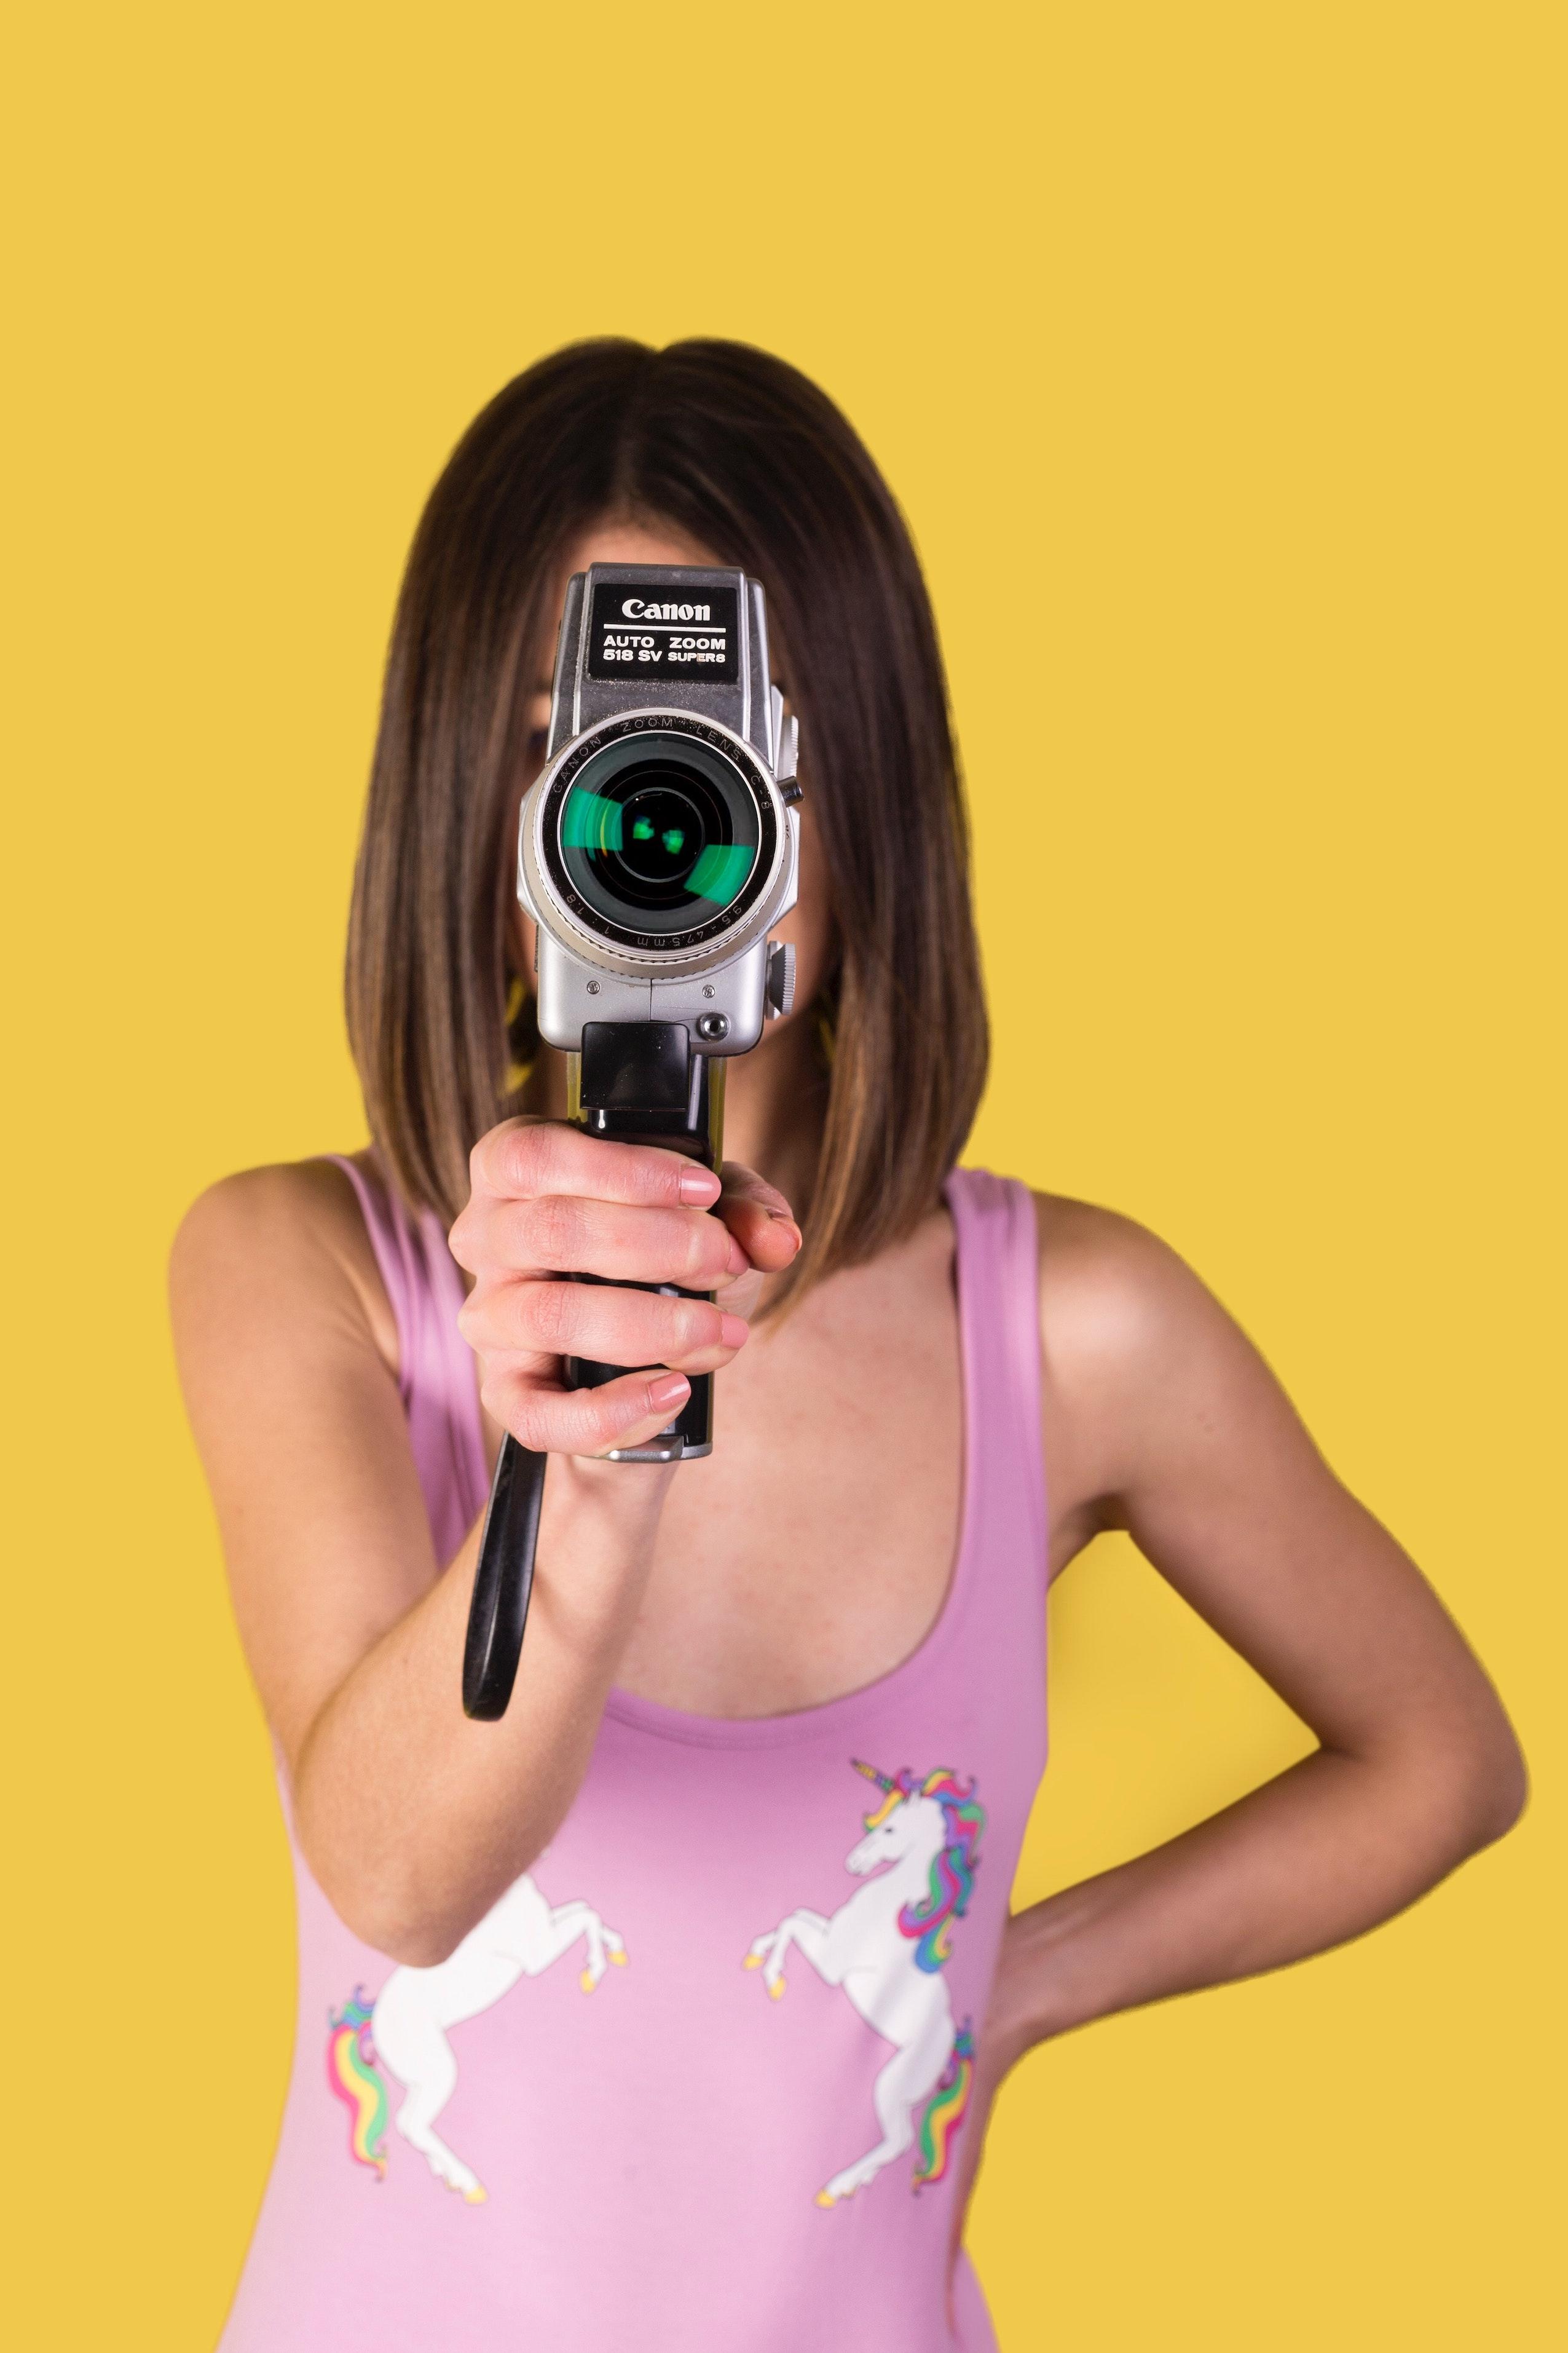 Femme avec caméra Canon